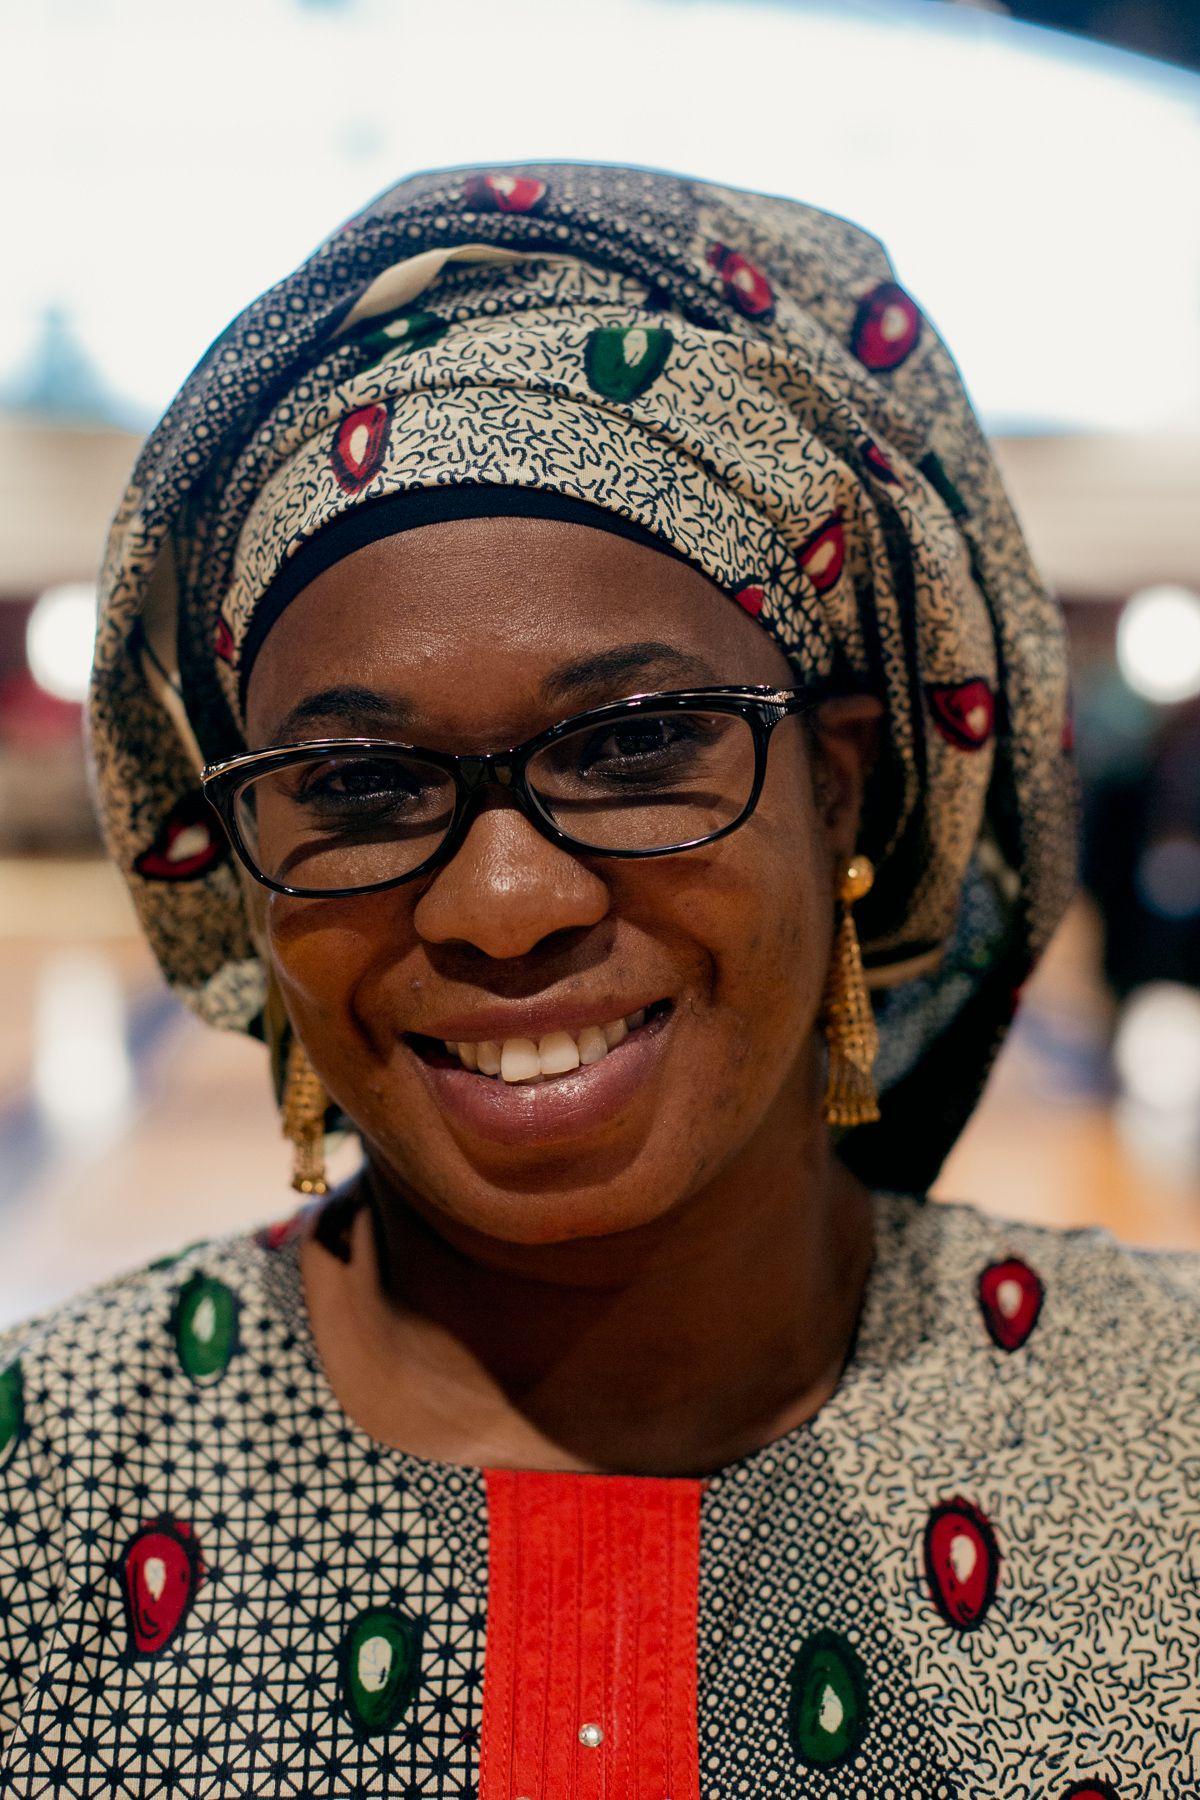 A woman in a gele, a Nigerian headwrap